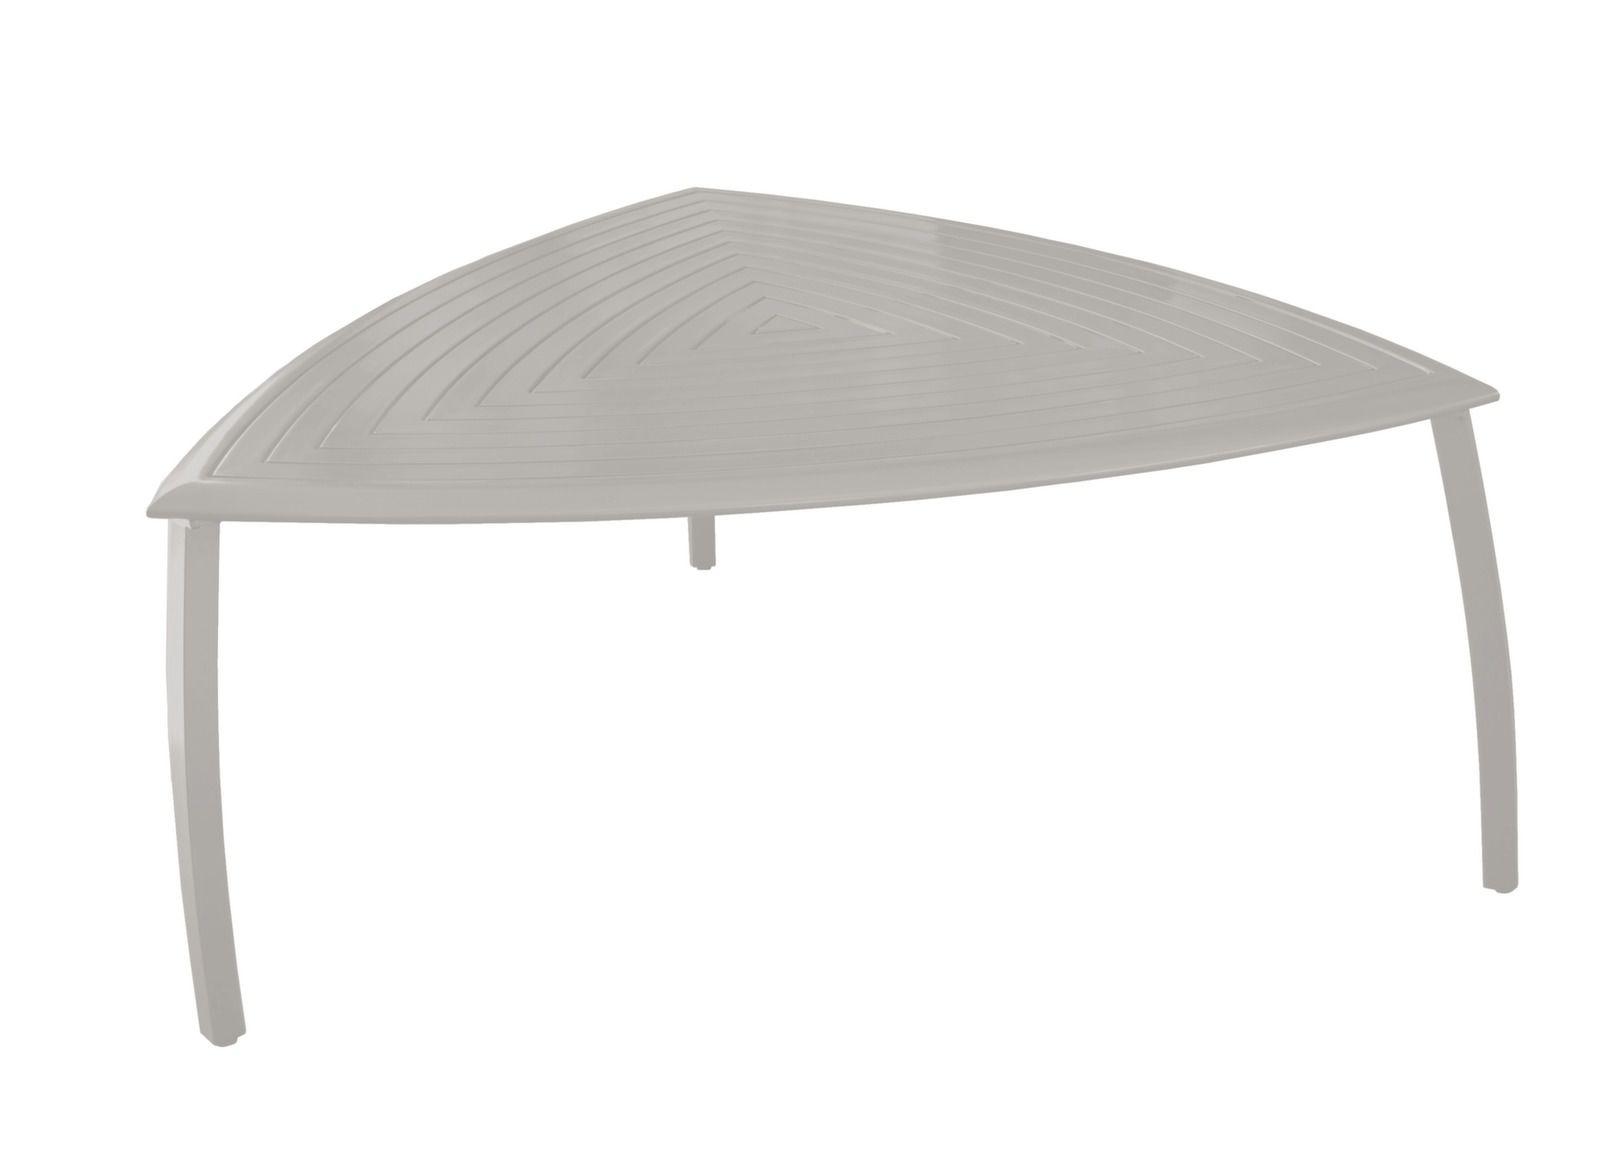 Table Azur Triangle, coloris light grey